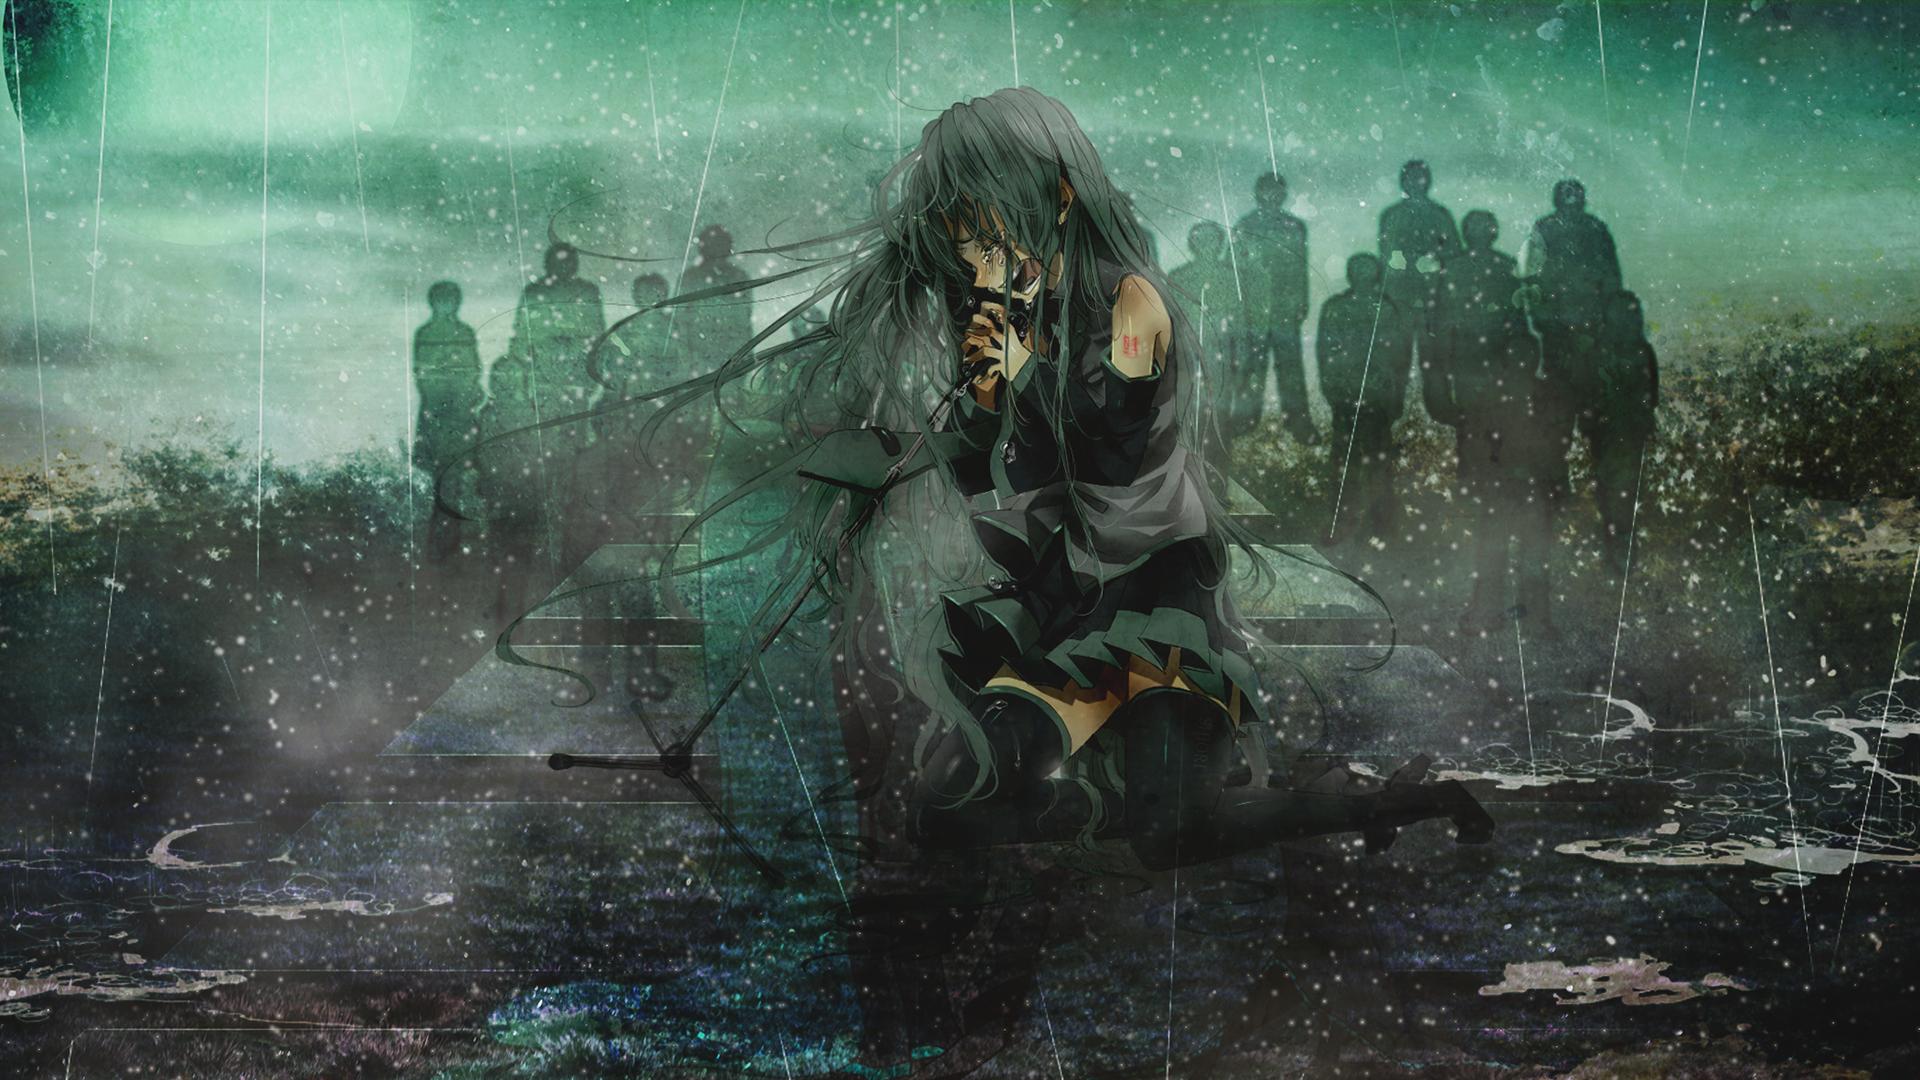 anime rain green wallpaper - photo #8